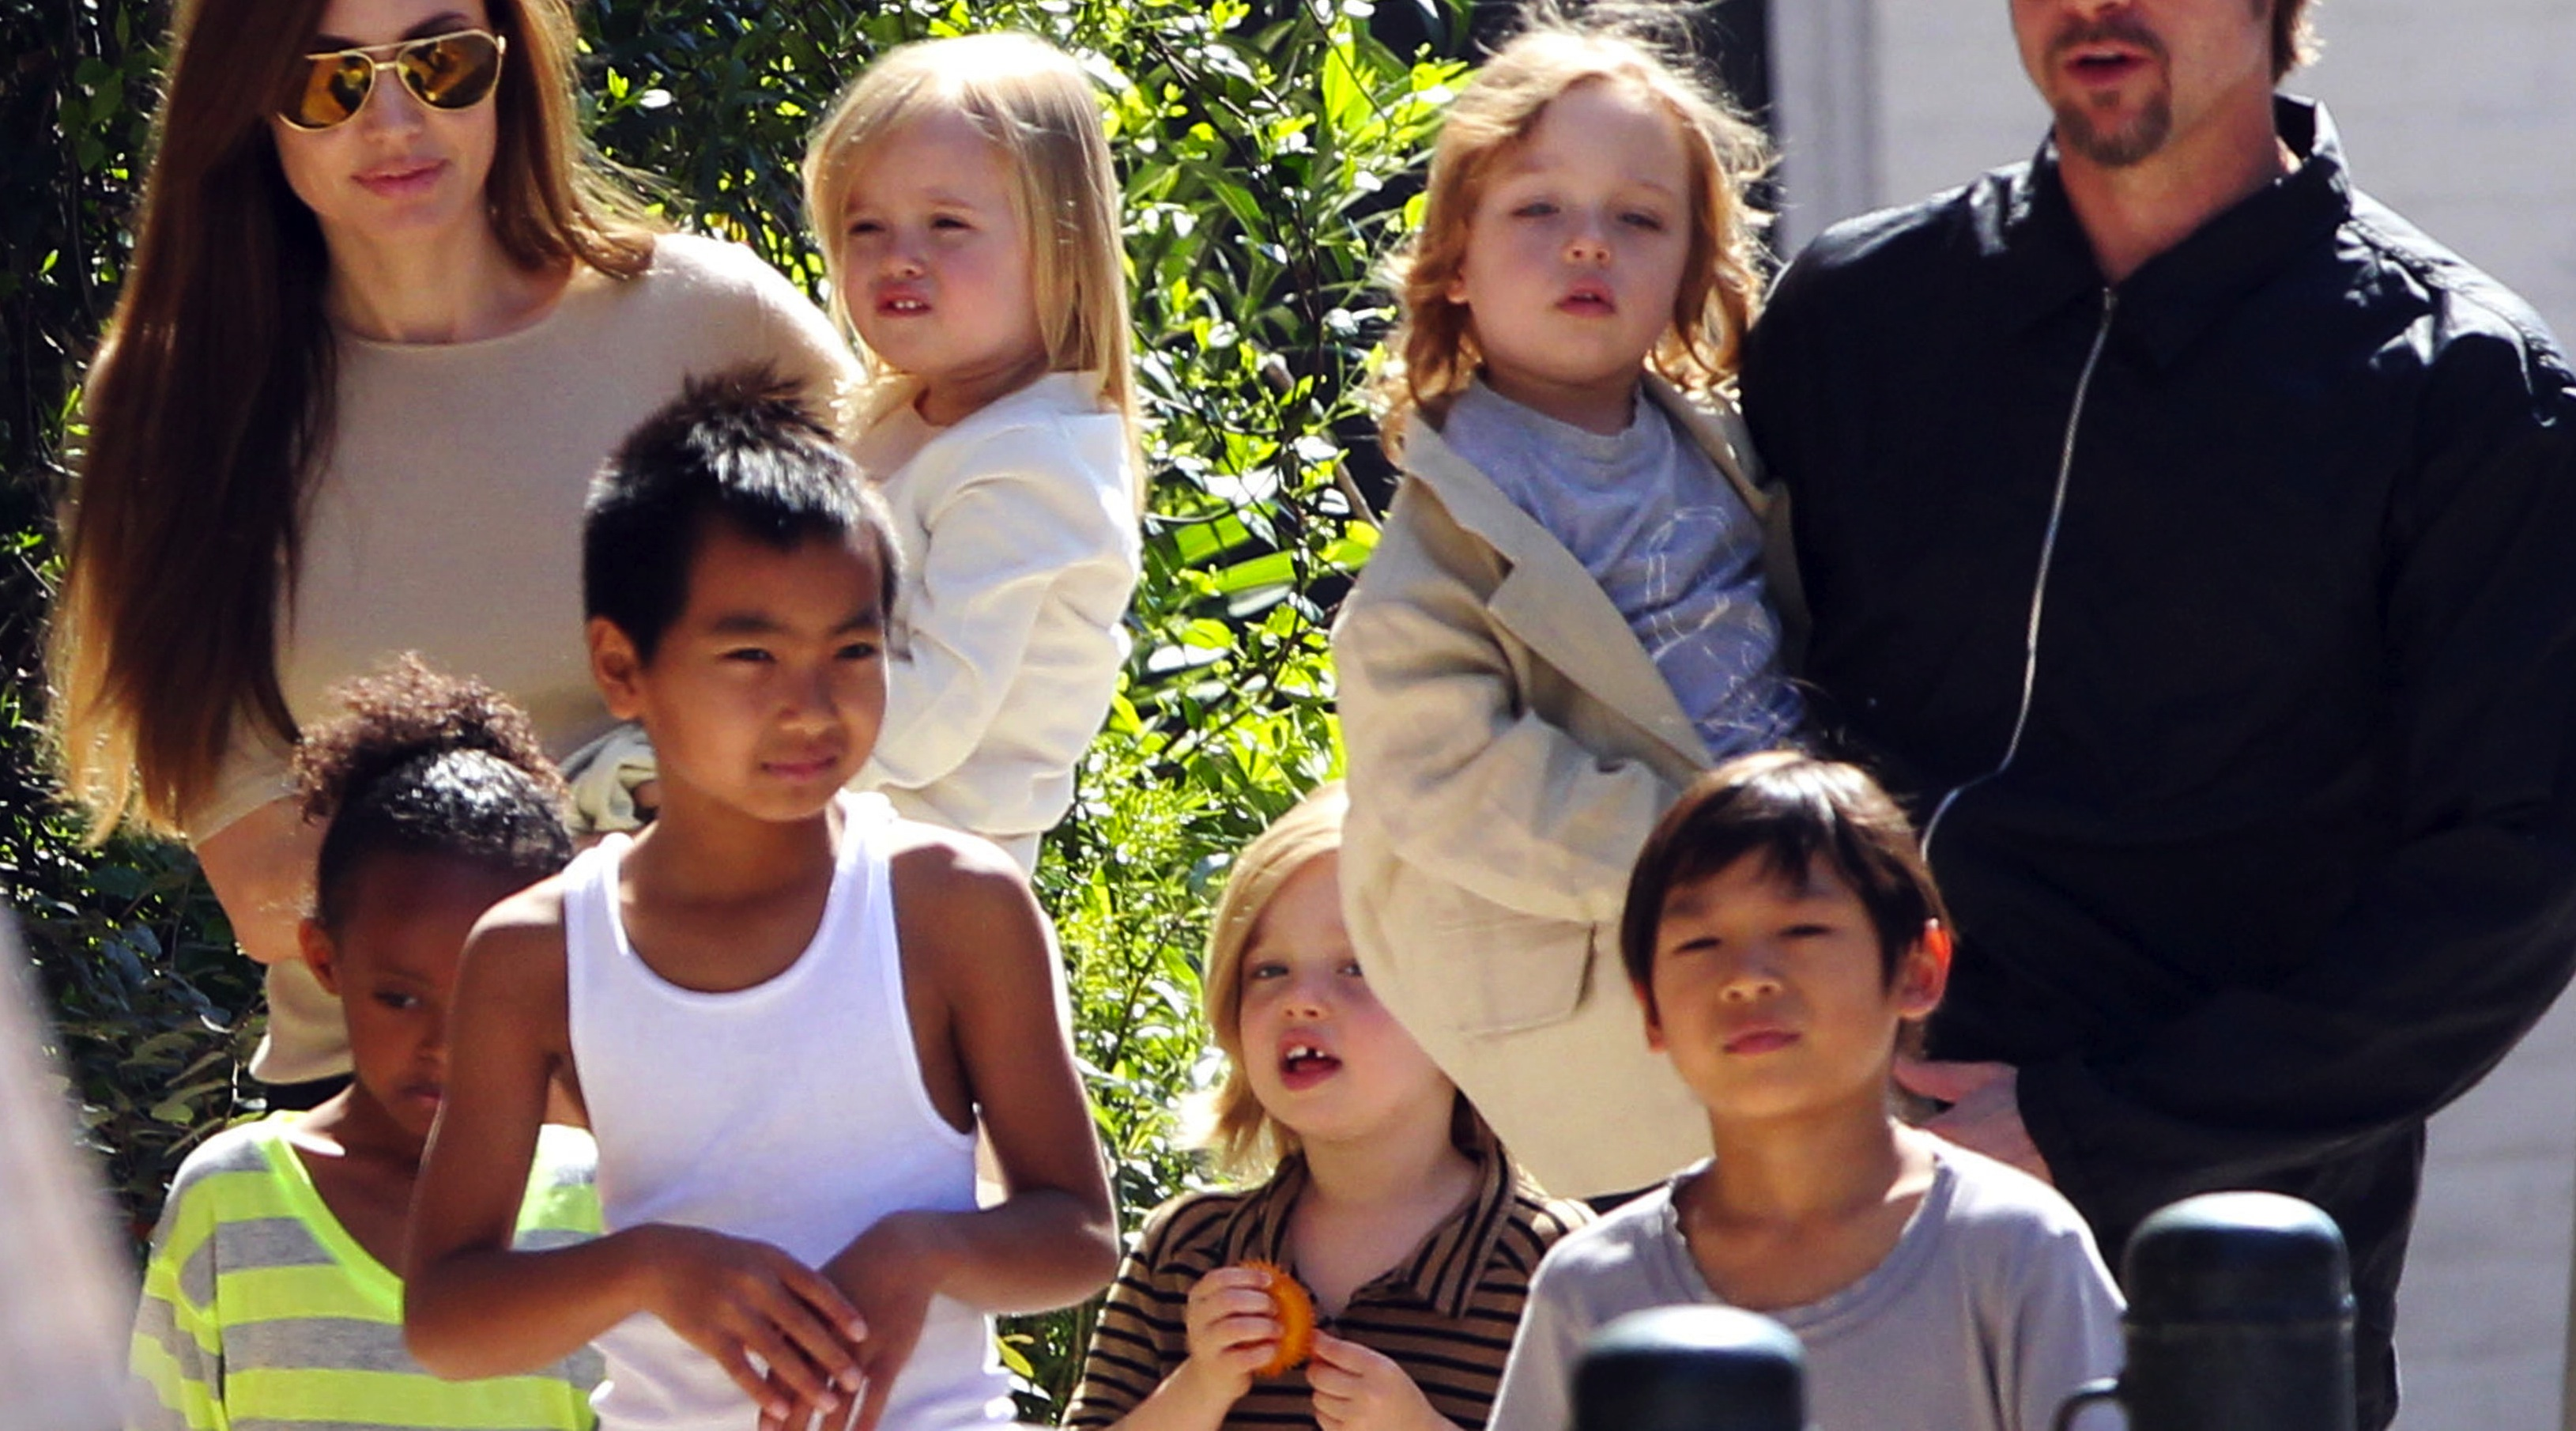 The Jolie-Pitt Family Enjoys The Big Easy